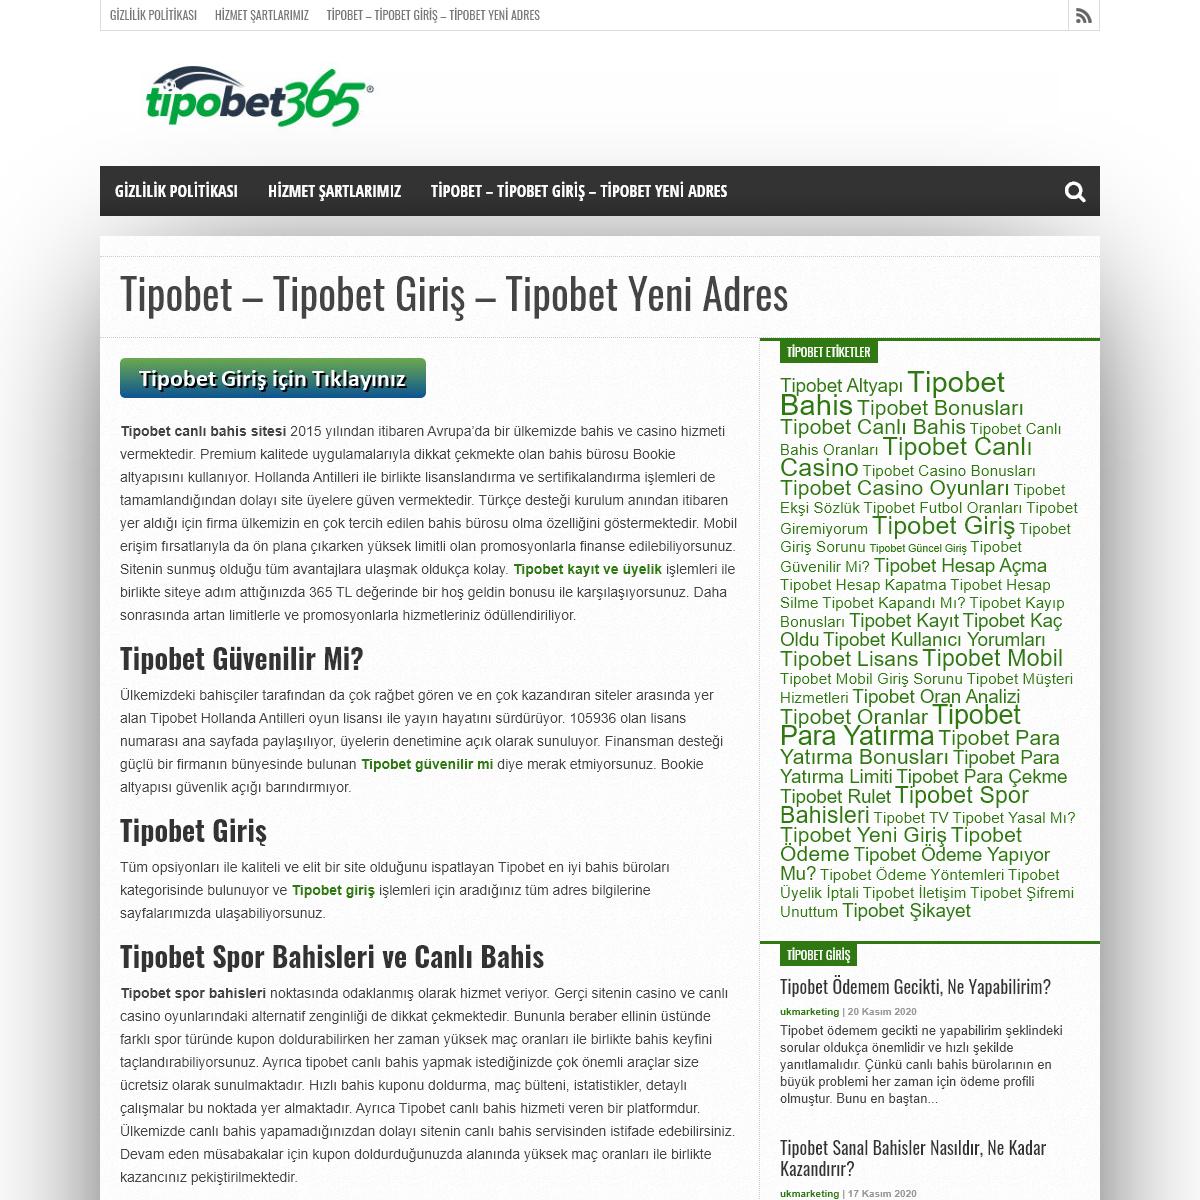 Tipobet - Tipobet Giriş - Tipobet Yeni Adres